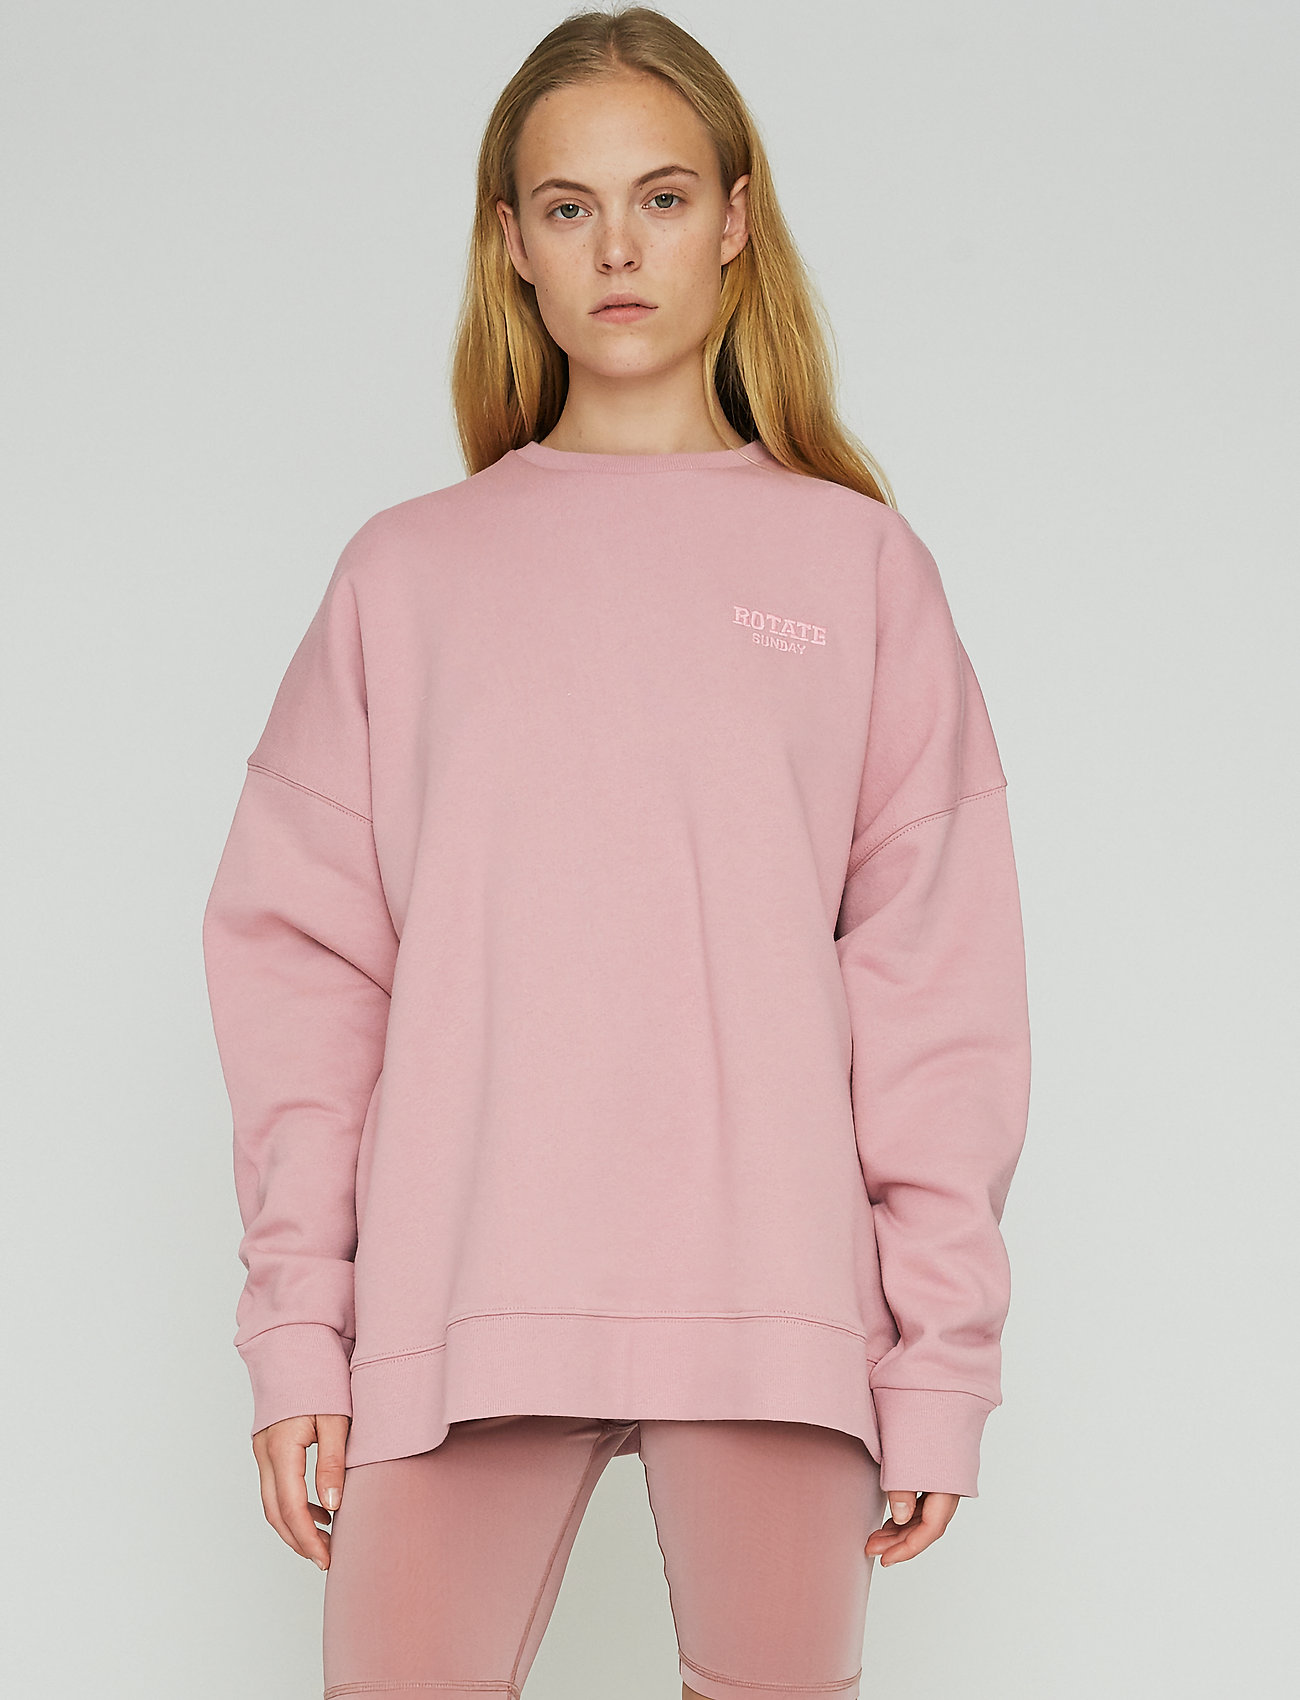 ROTATE Birger Christensen - Iris Crewneck - sweatshirts en hoodies - lilas - 0